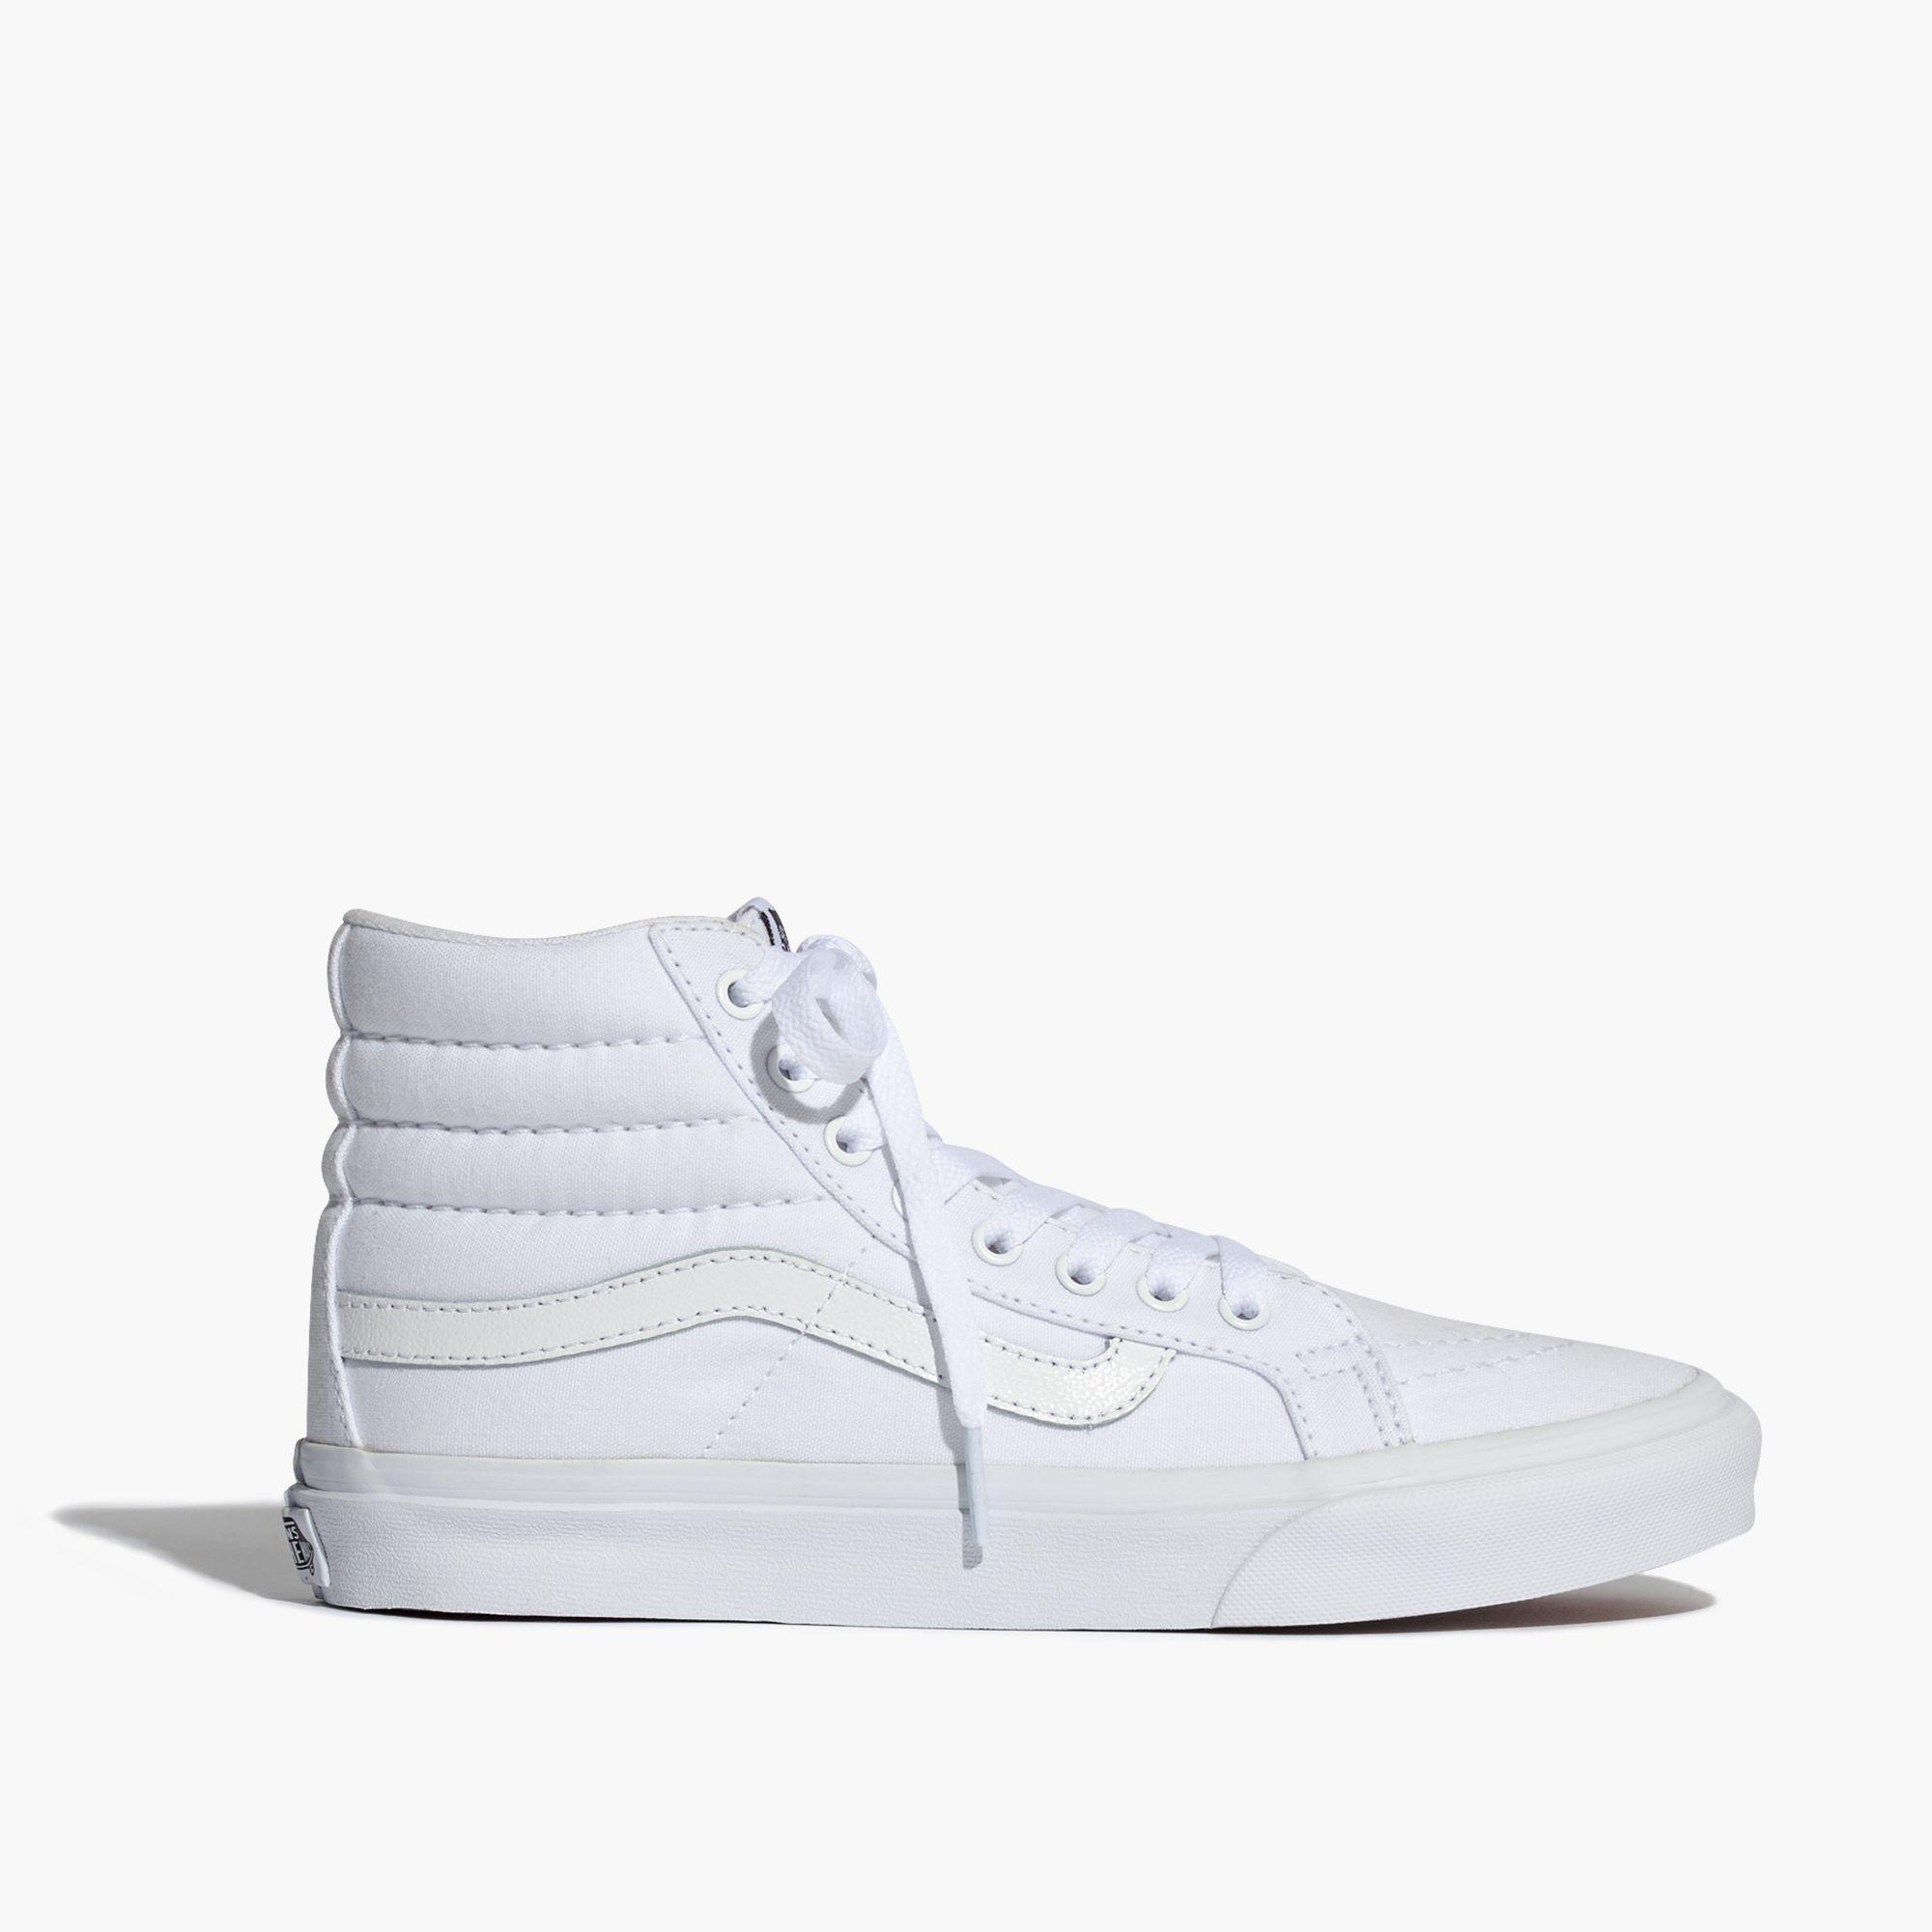 0b8704a9f4 Madewell Vans® Sk8-hi Slim High-top Sneakers In Canvas in White - Lyst